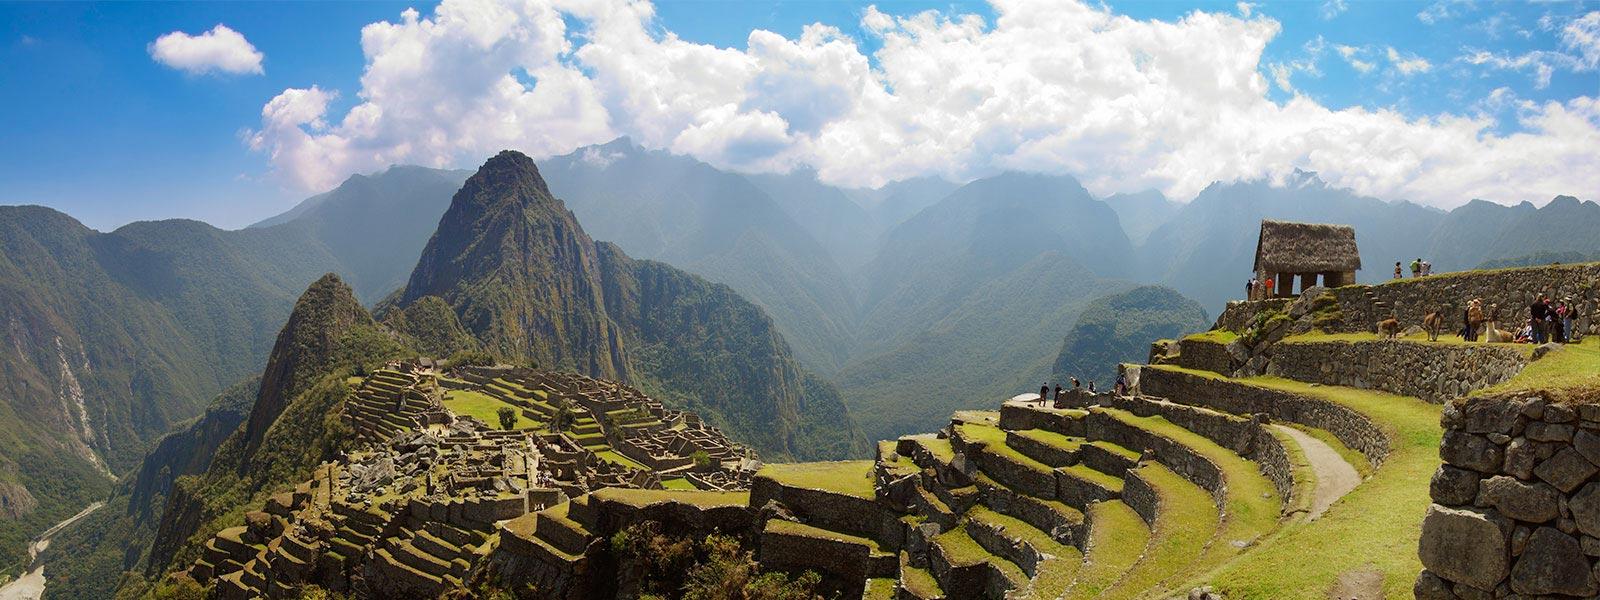 Image panoramique du Machu Picchu